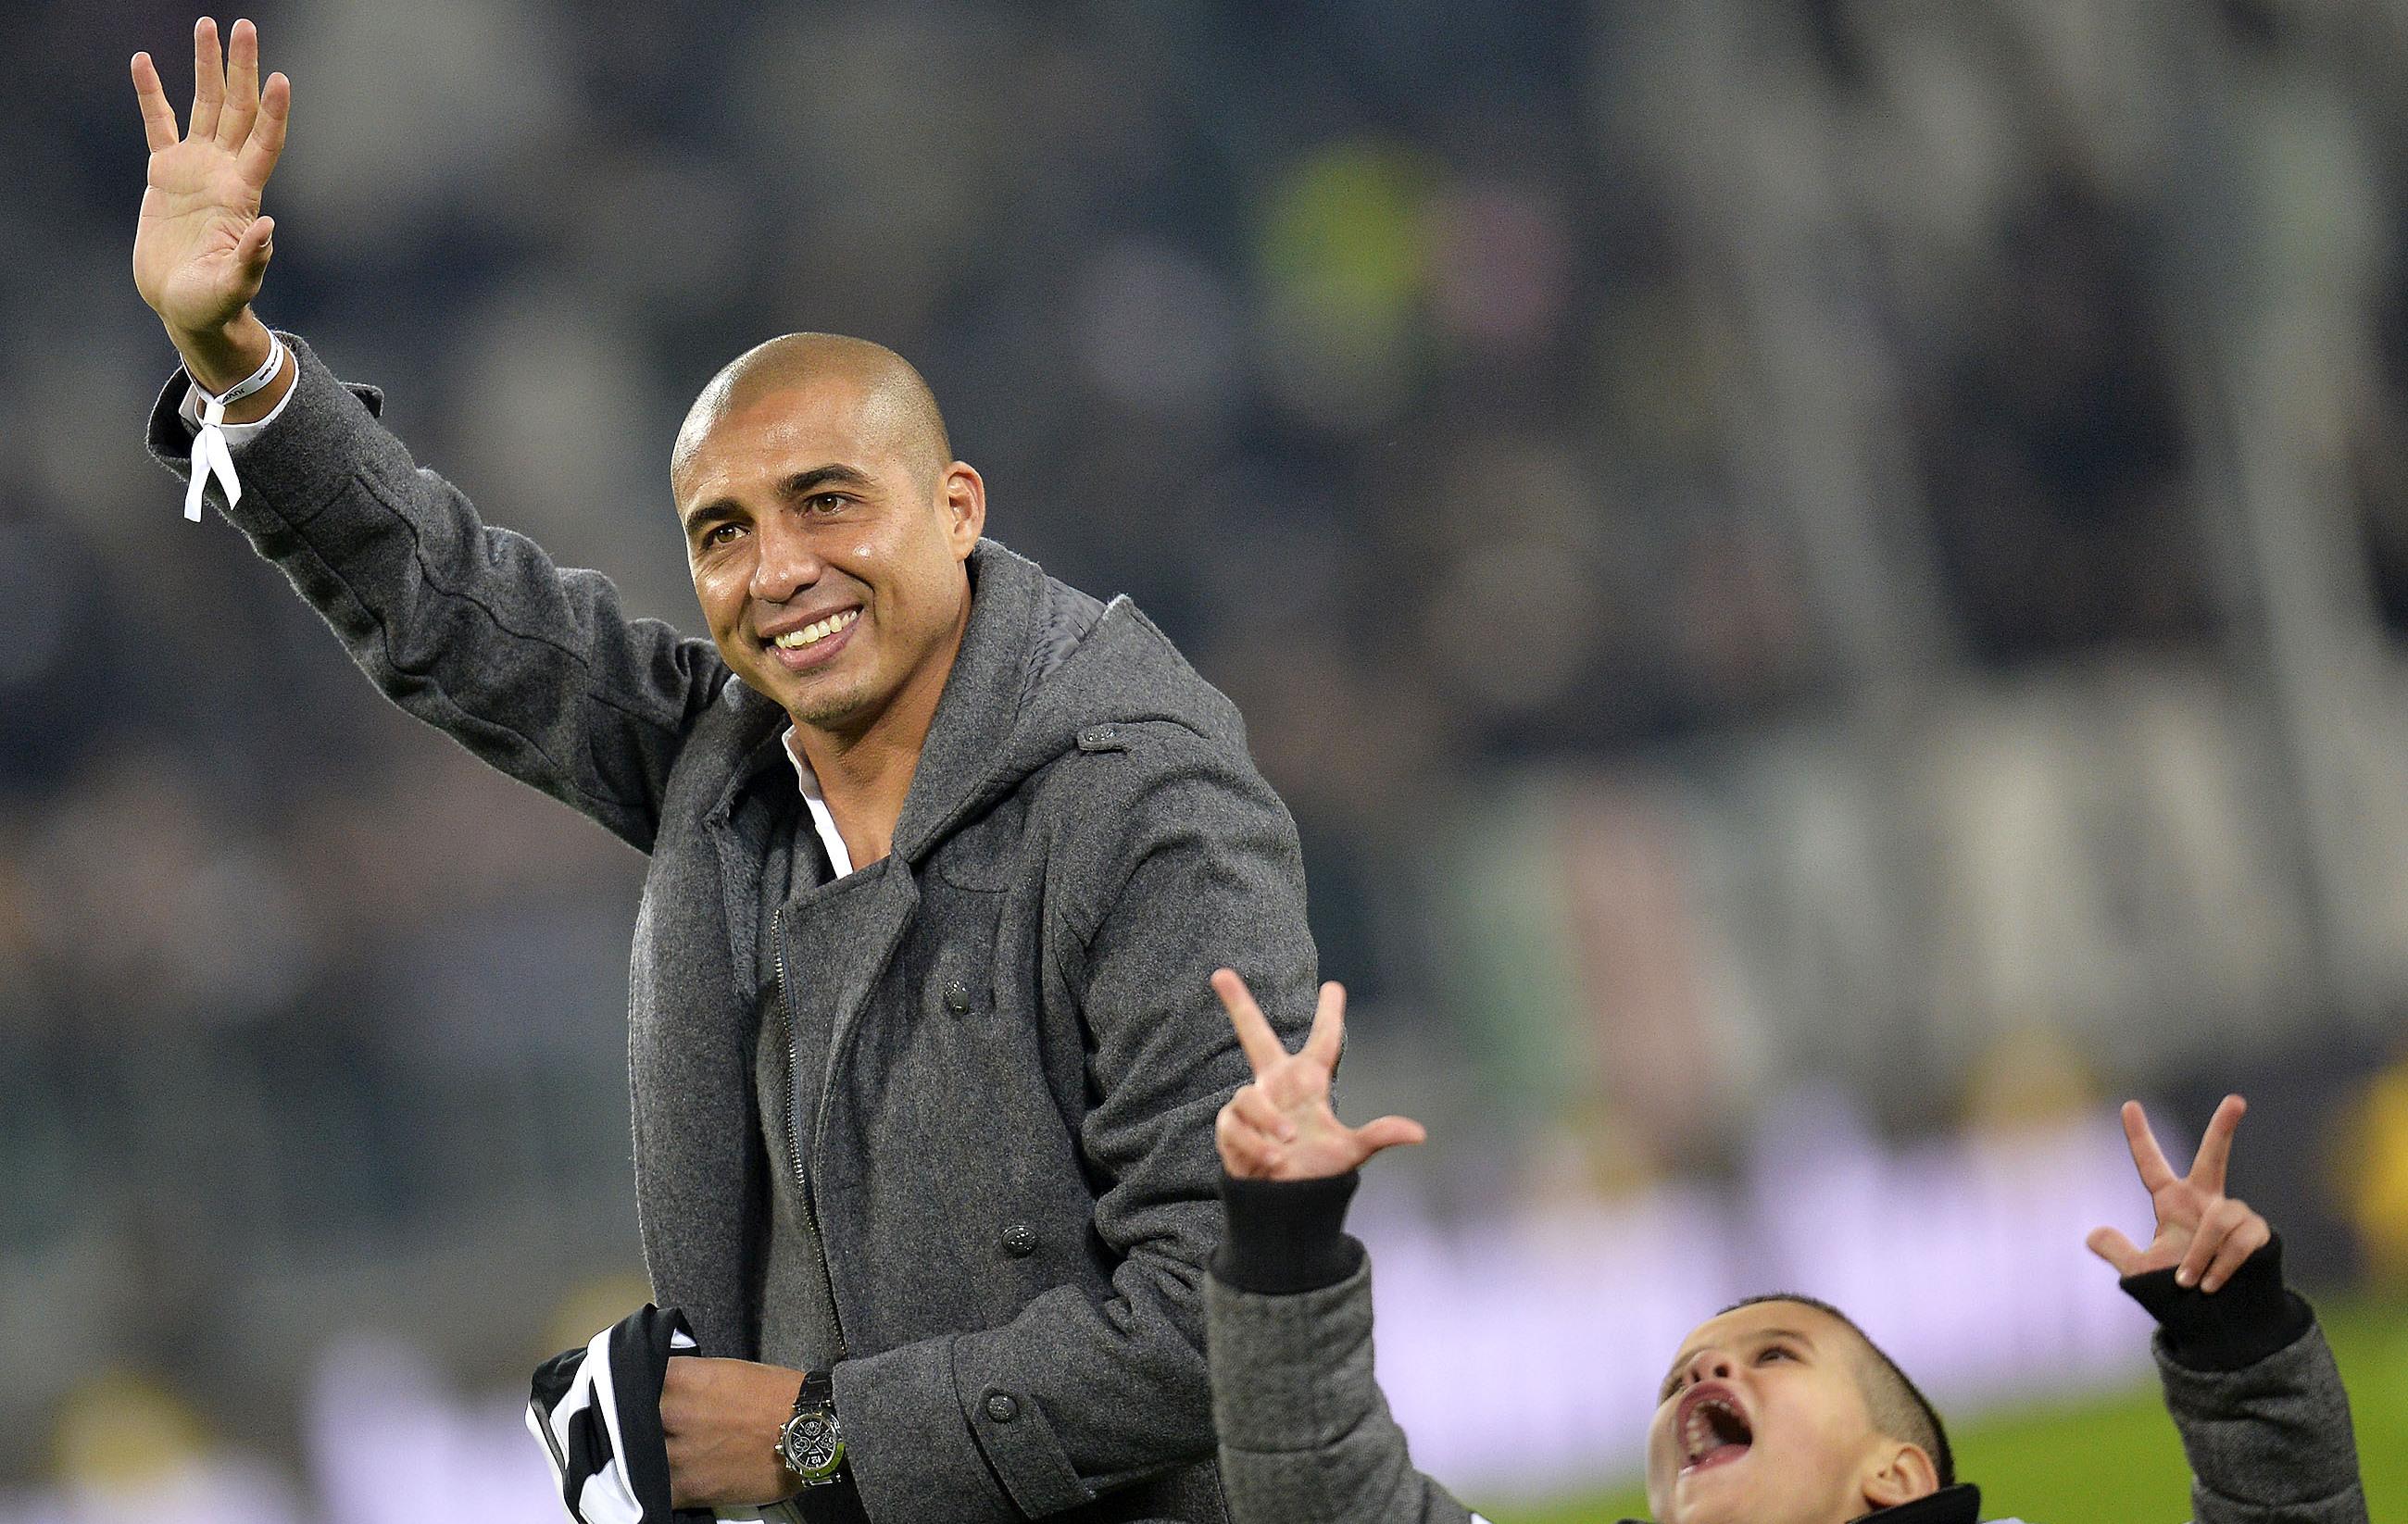 FOOTBALL : Juventus Turin vs As Rome - Calcio - Serie A - 05/01/2014